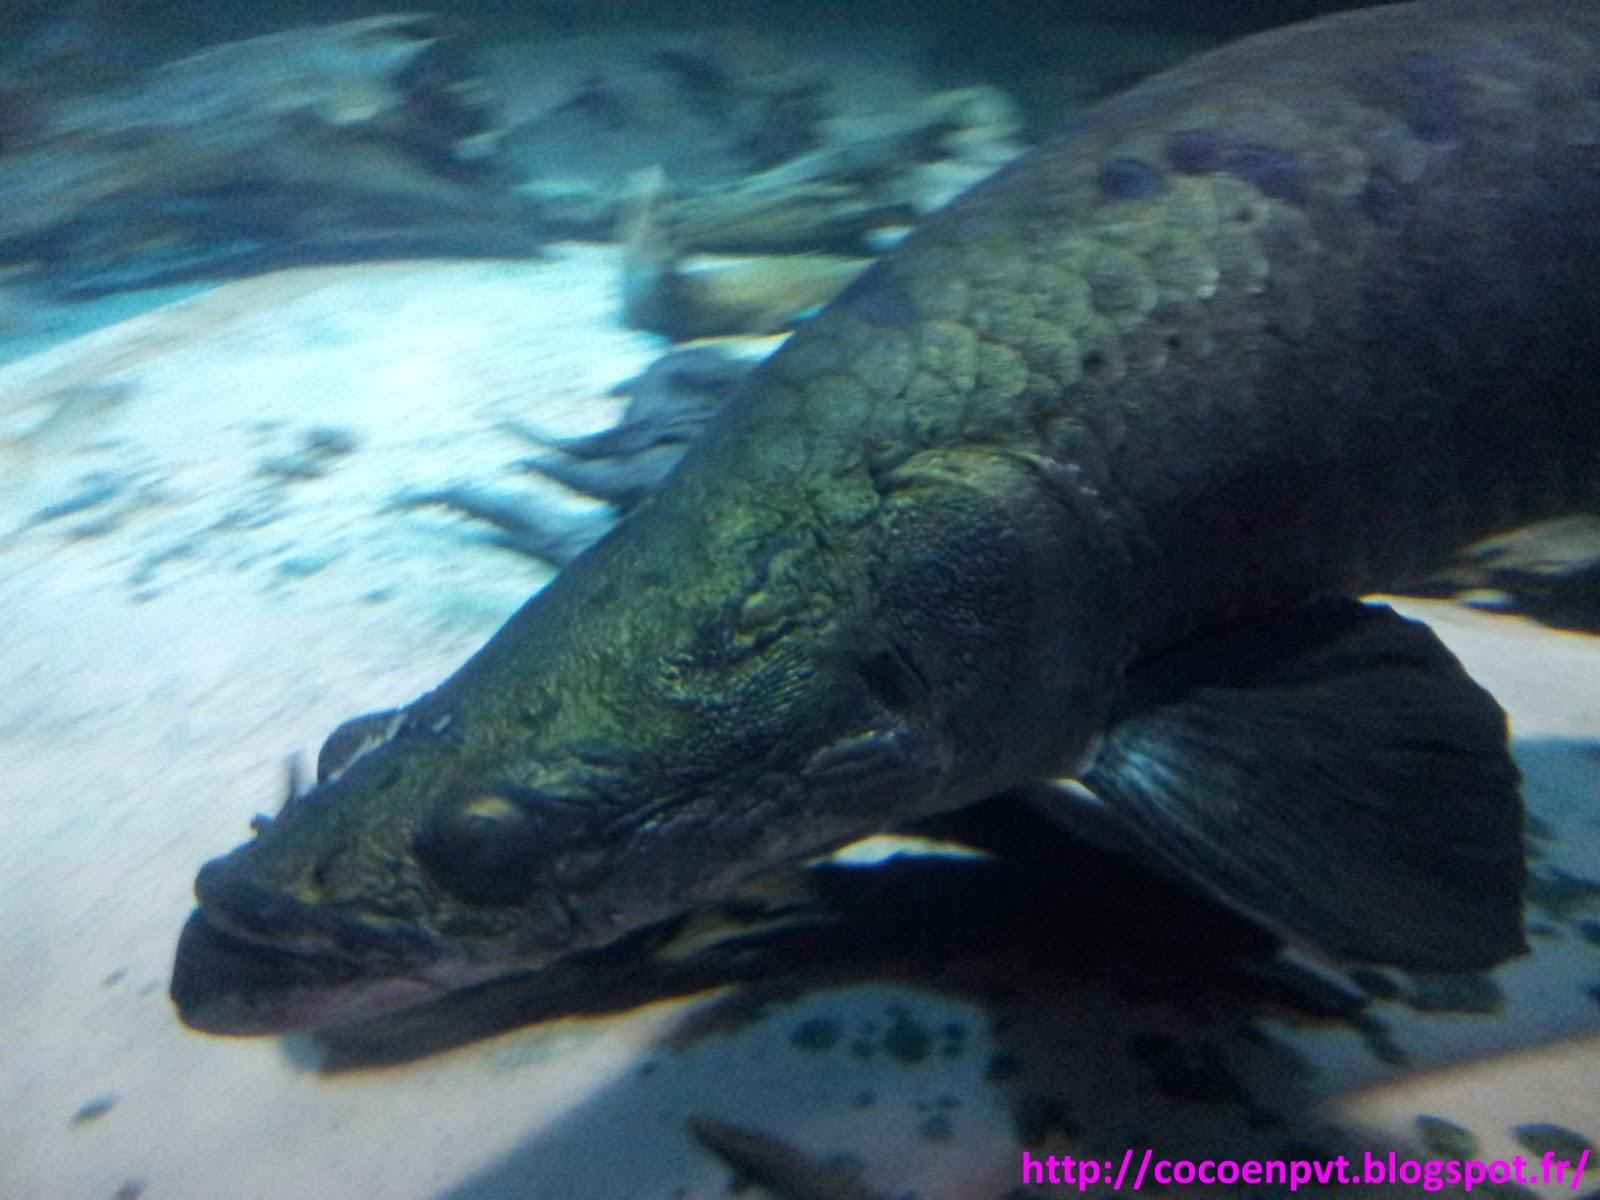 Coco en pvt aquarium de vancouver for Gros poisson aquarium